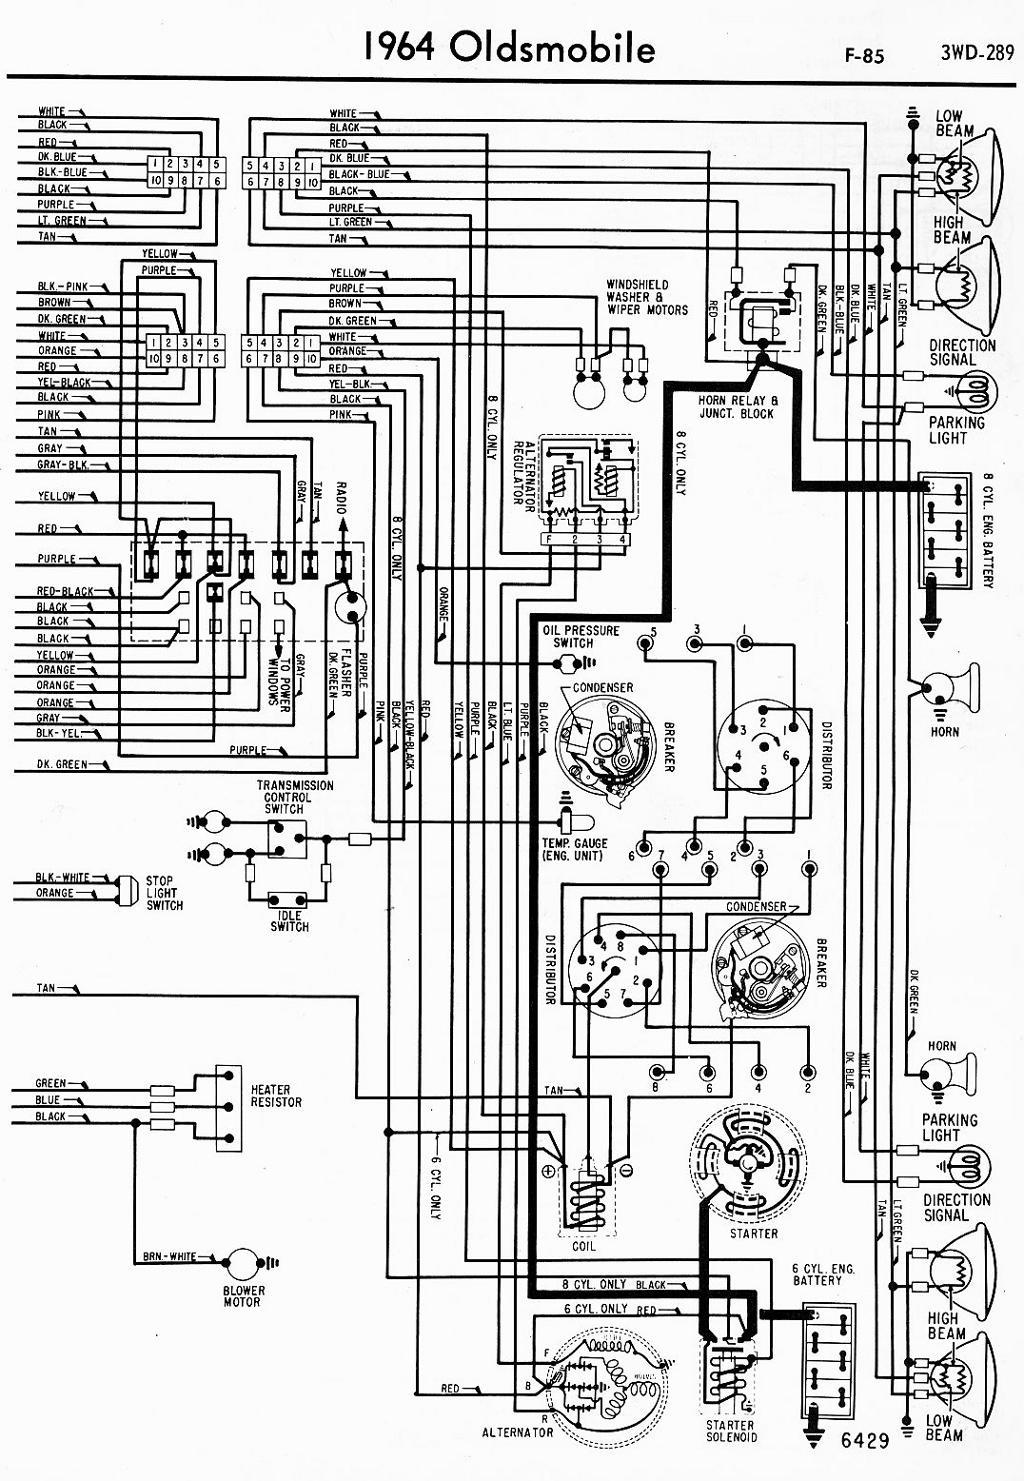 hight resolution of 1967 oldsmobile toronado wiring diagram wiring library rh 50 skriptoase de 1968 oldsmobile cutlass wiring